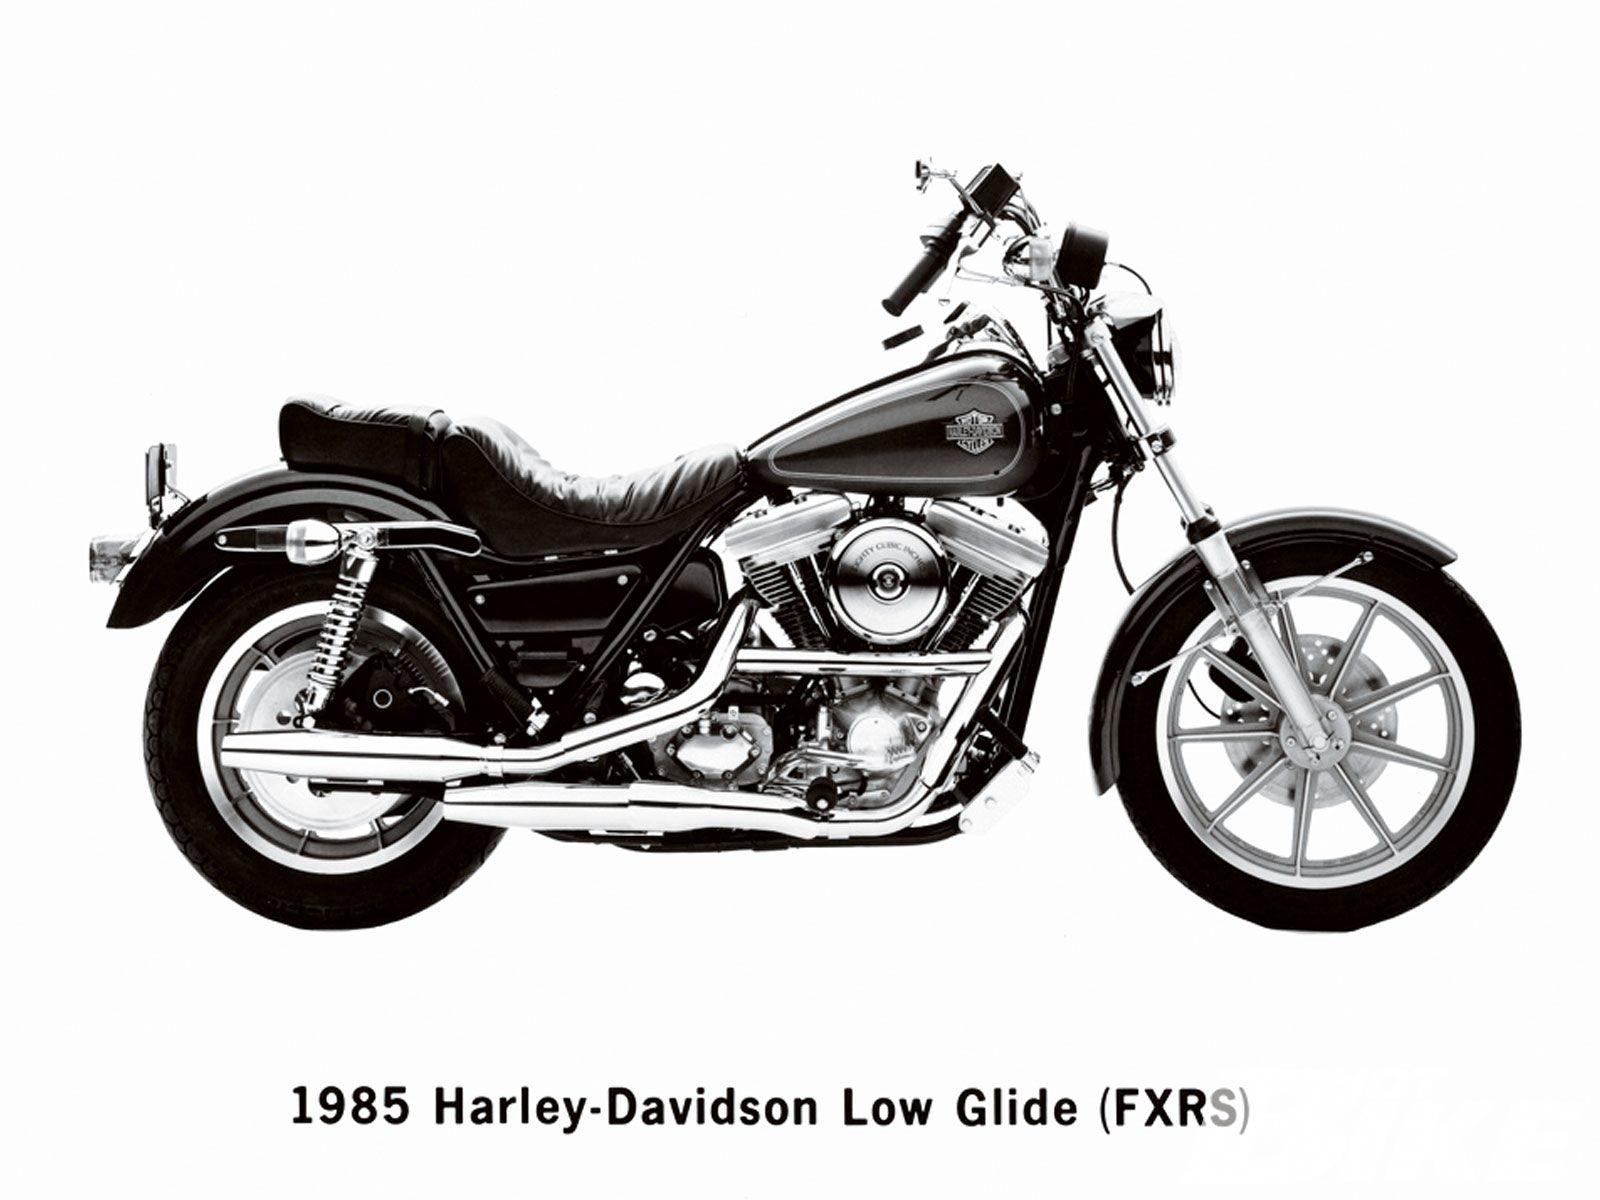 Harley Fxr Wiring Diagram - Wiring Diagrams List on